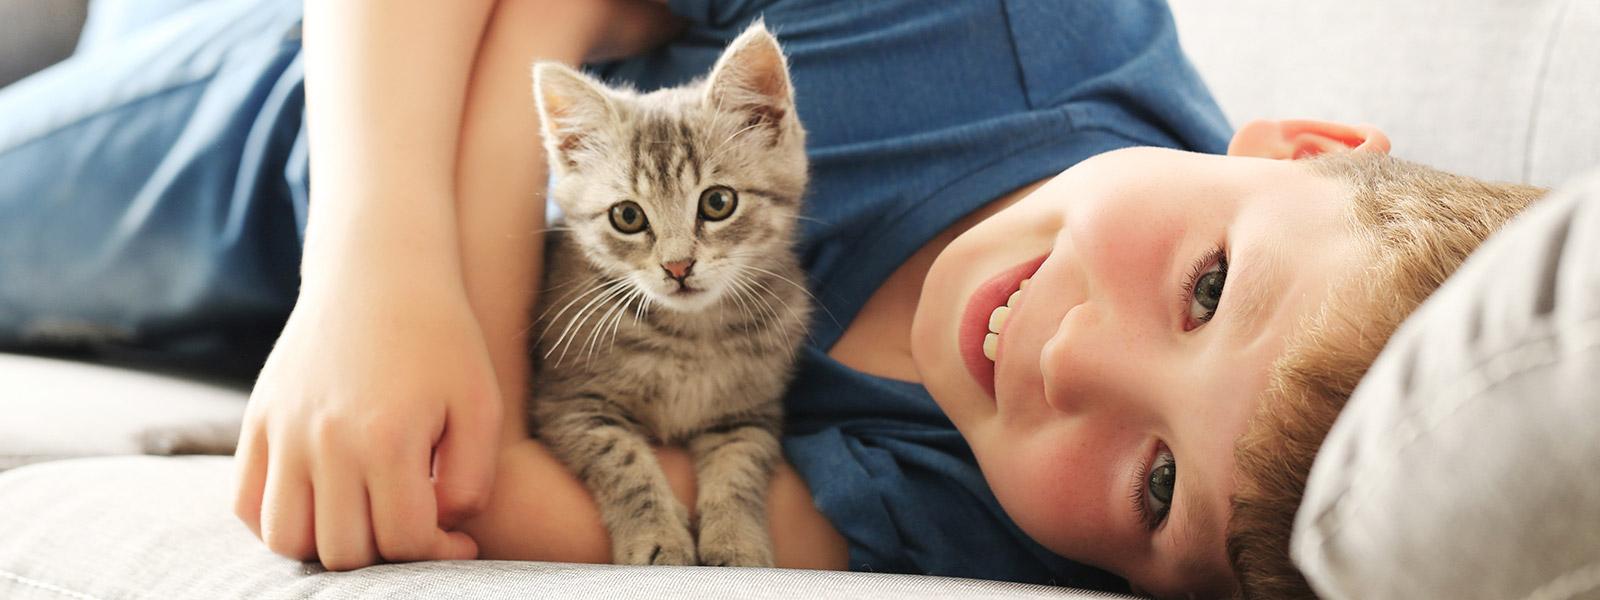 Kitten Adoptions Cat Adoptions Vets In Cranbourne